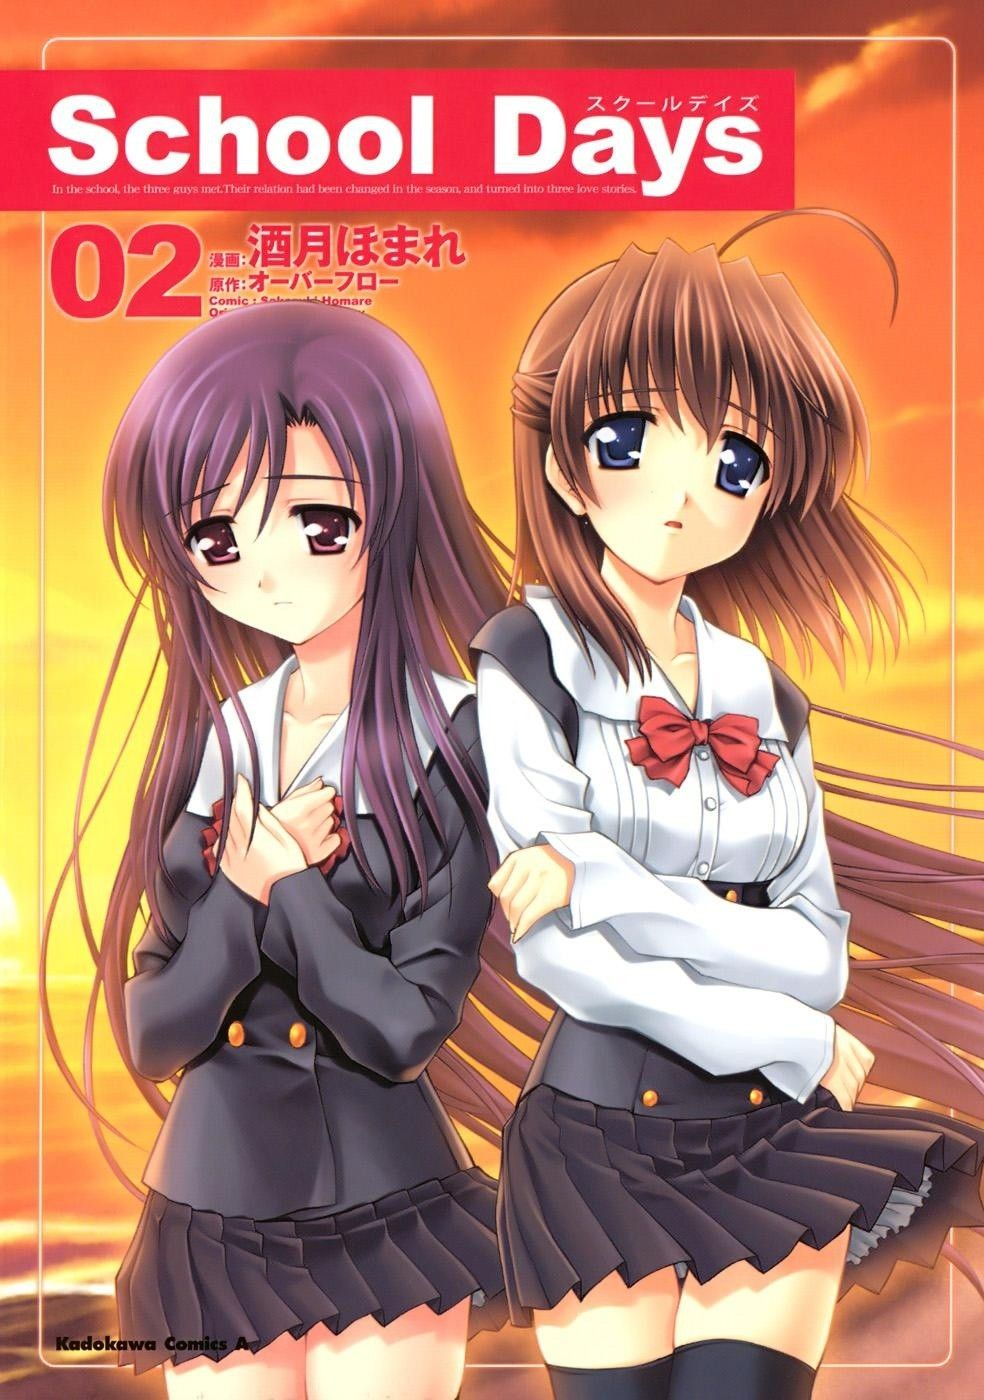 Pin by Mariko Heartfilia on Anime in 2020 Anime, School